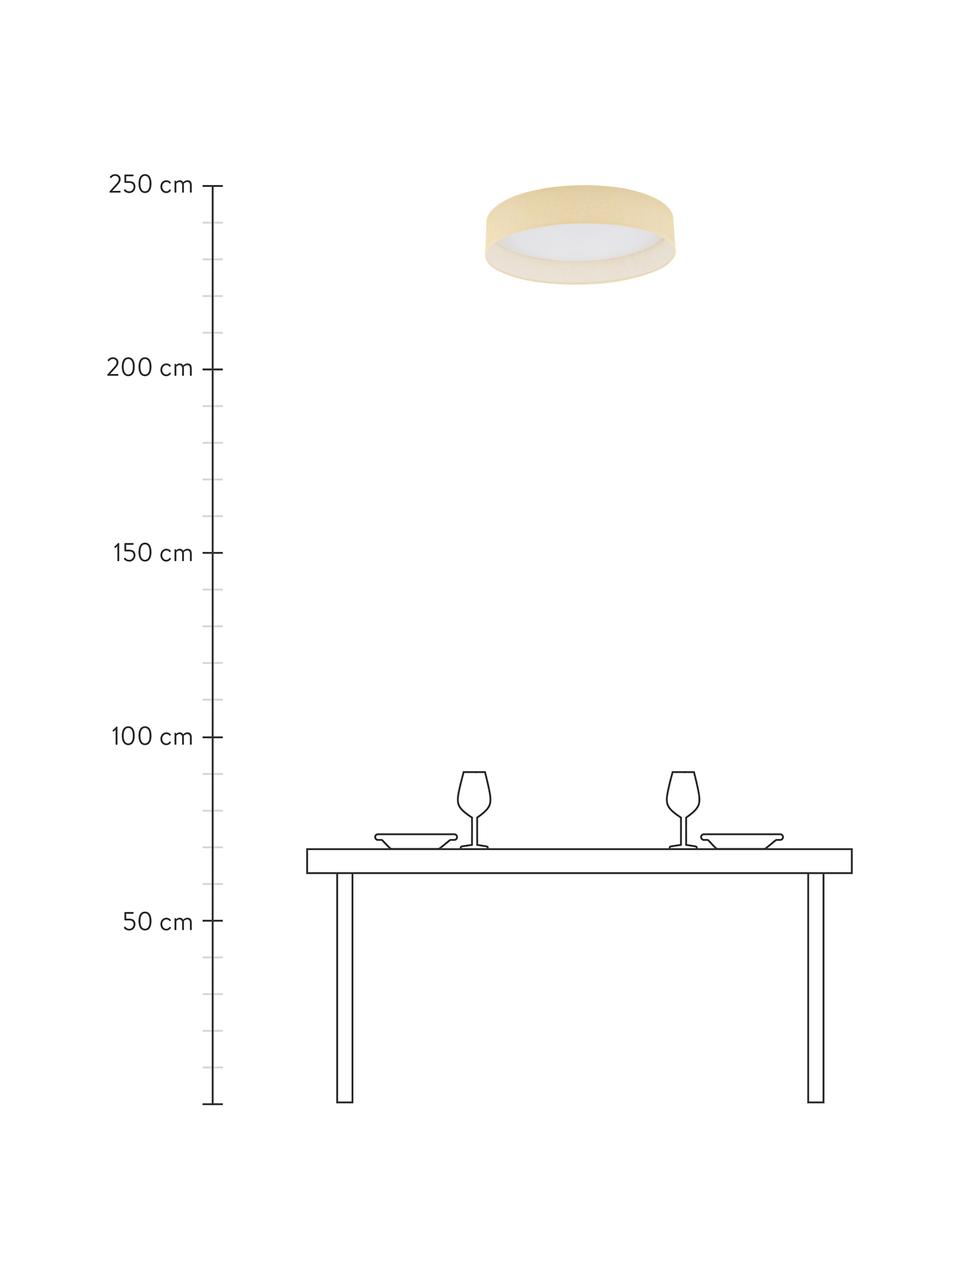 Lampa sufitowa LED Helen Nature, Beżowy, Ø 52 x W 11 cm